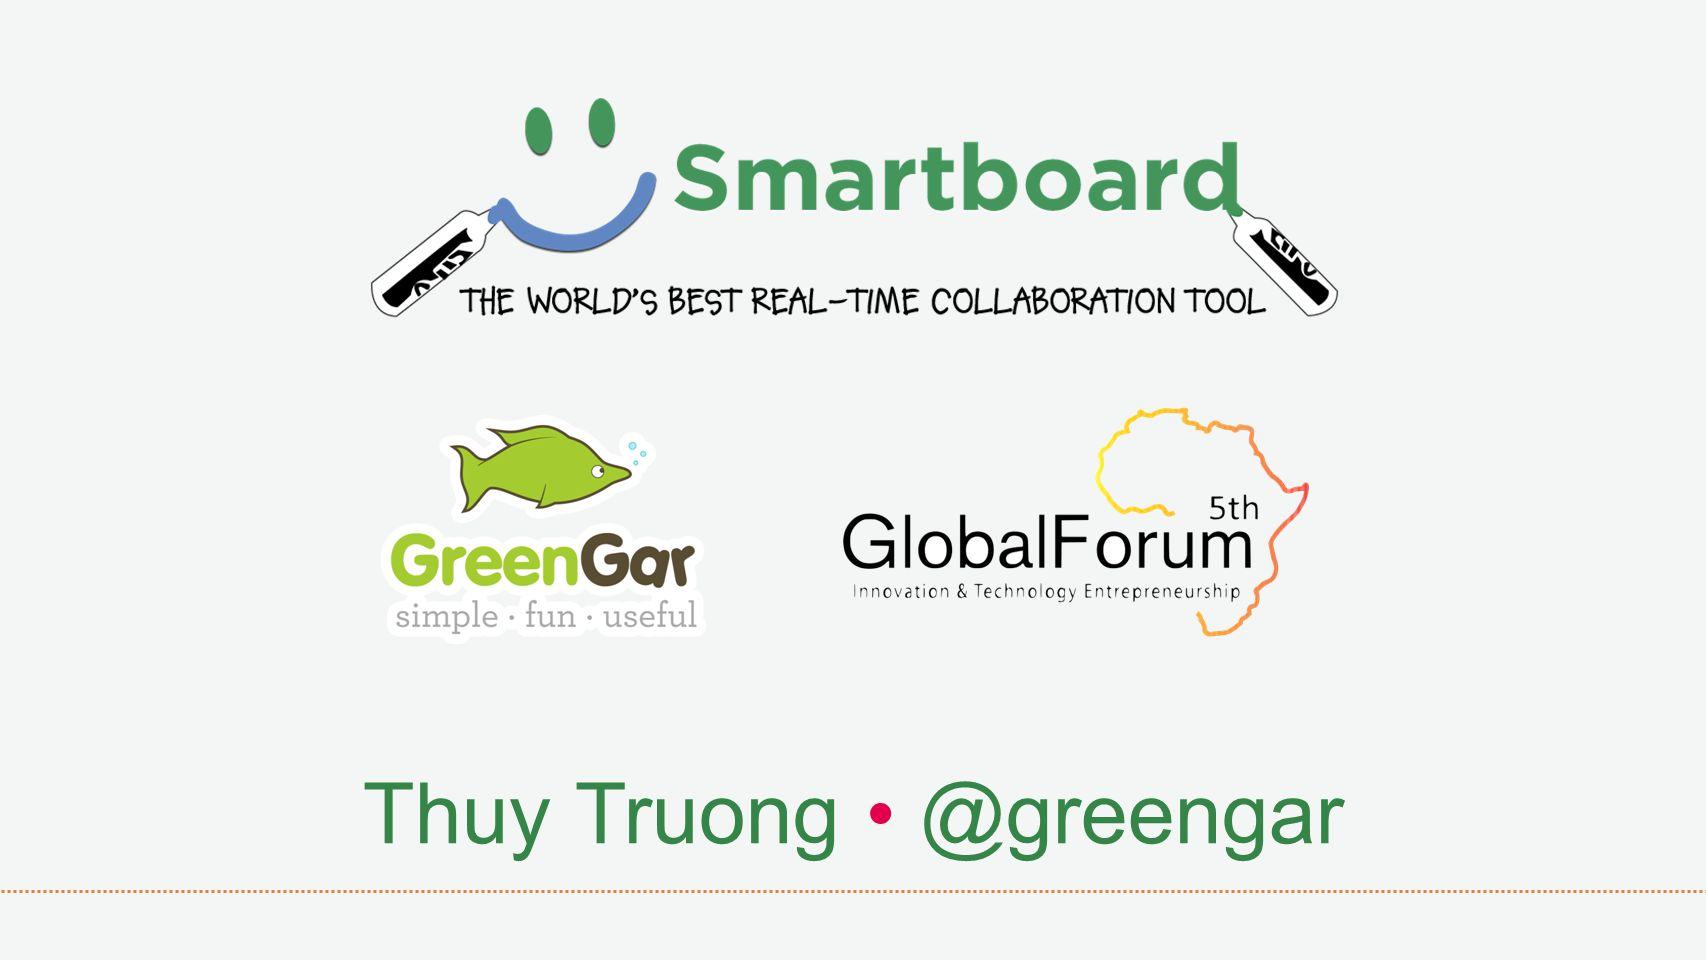 Thuy Truong @greengar